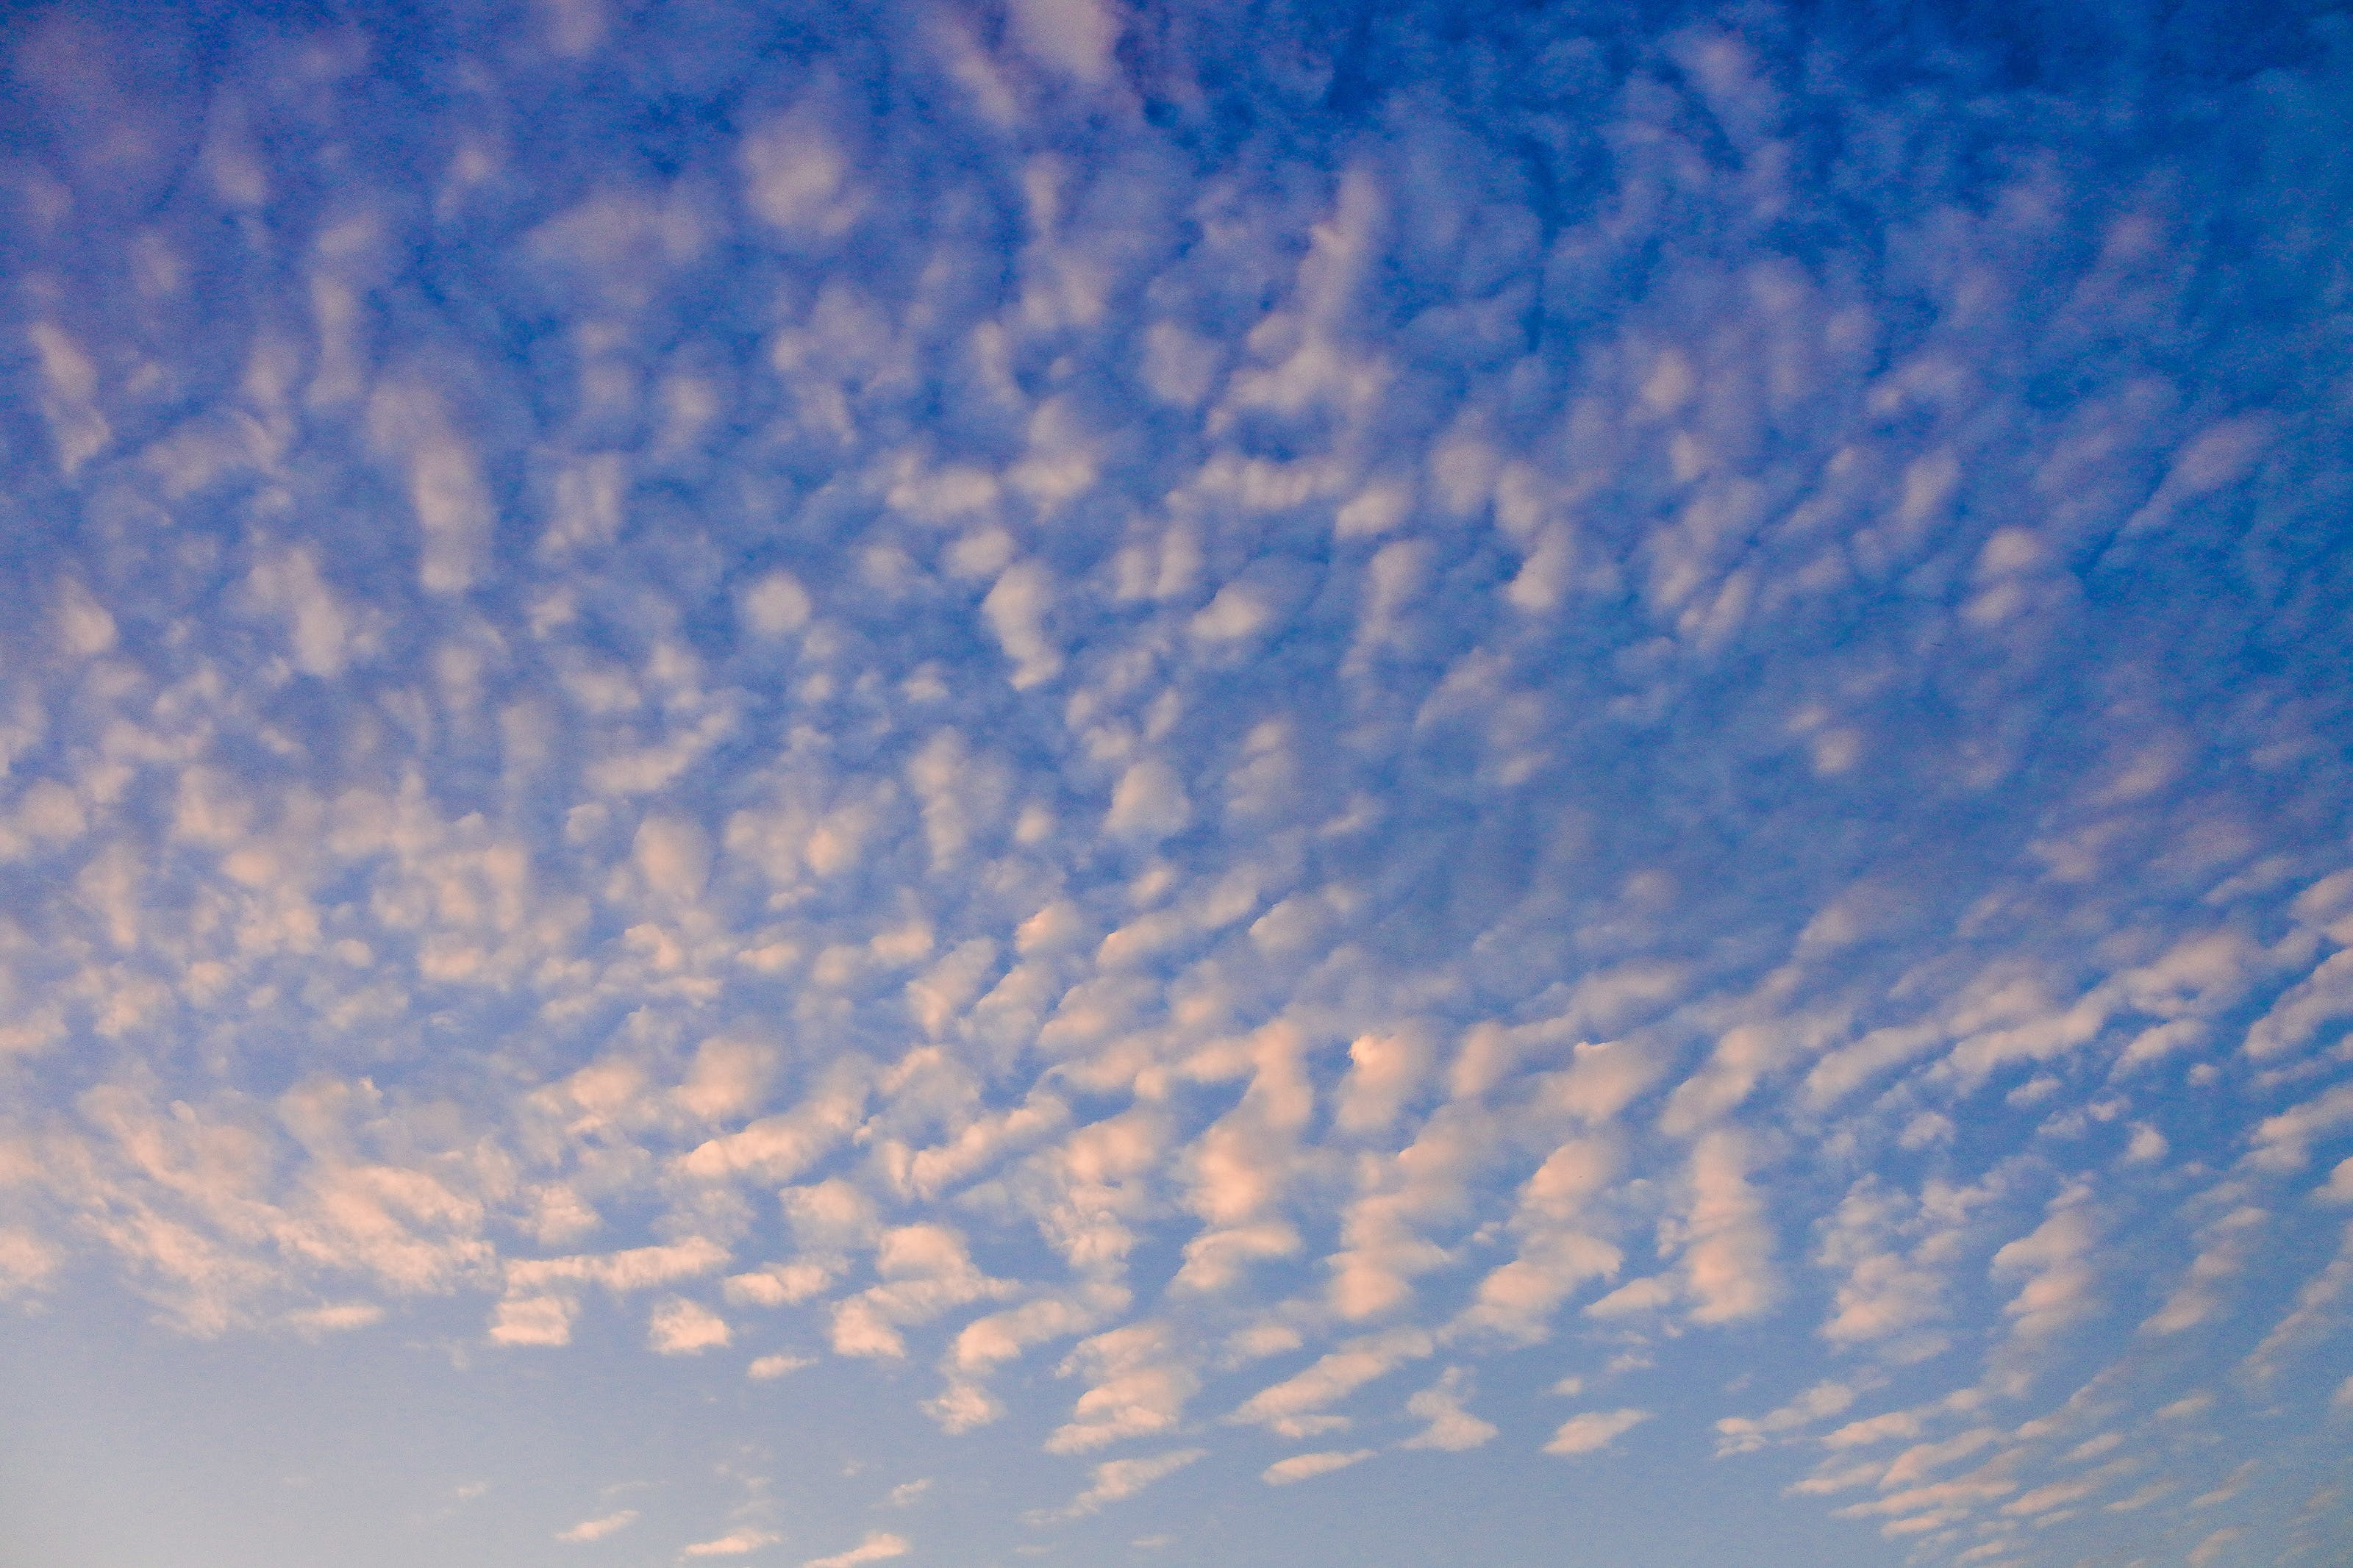 Foto stok gratis alam, angkasa, awan, bentangan awan